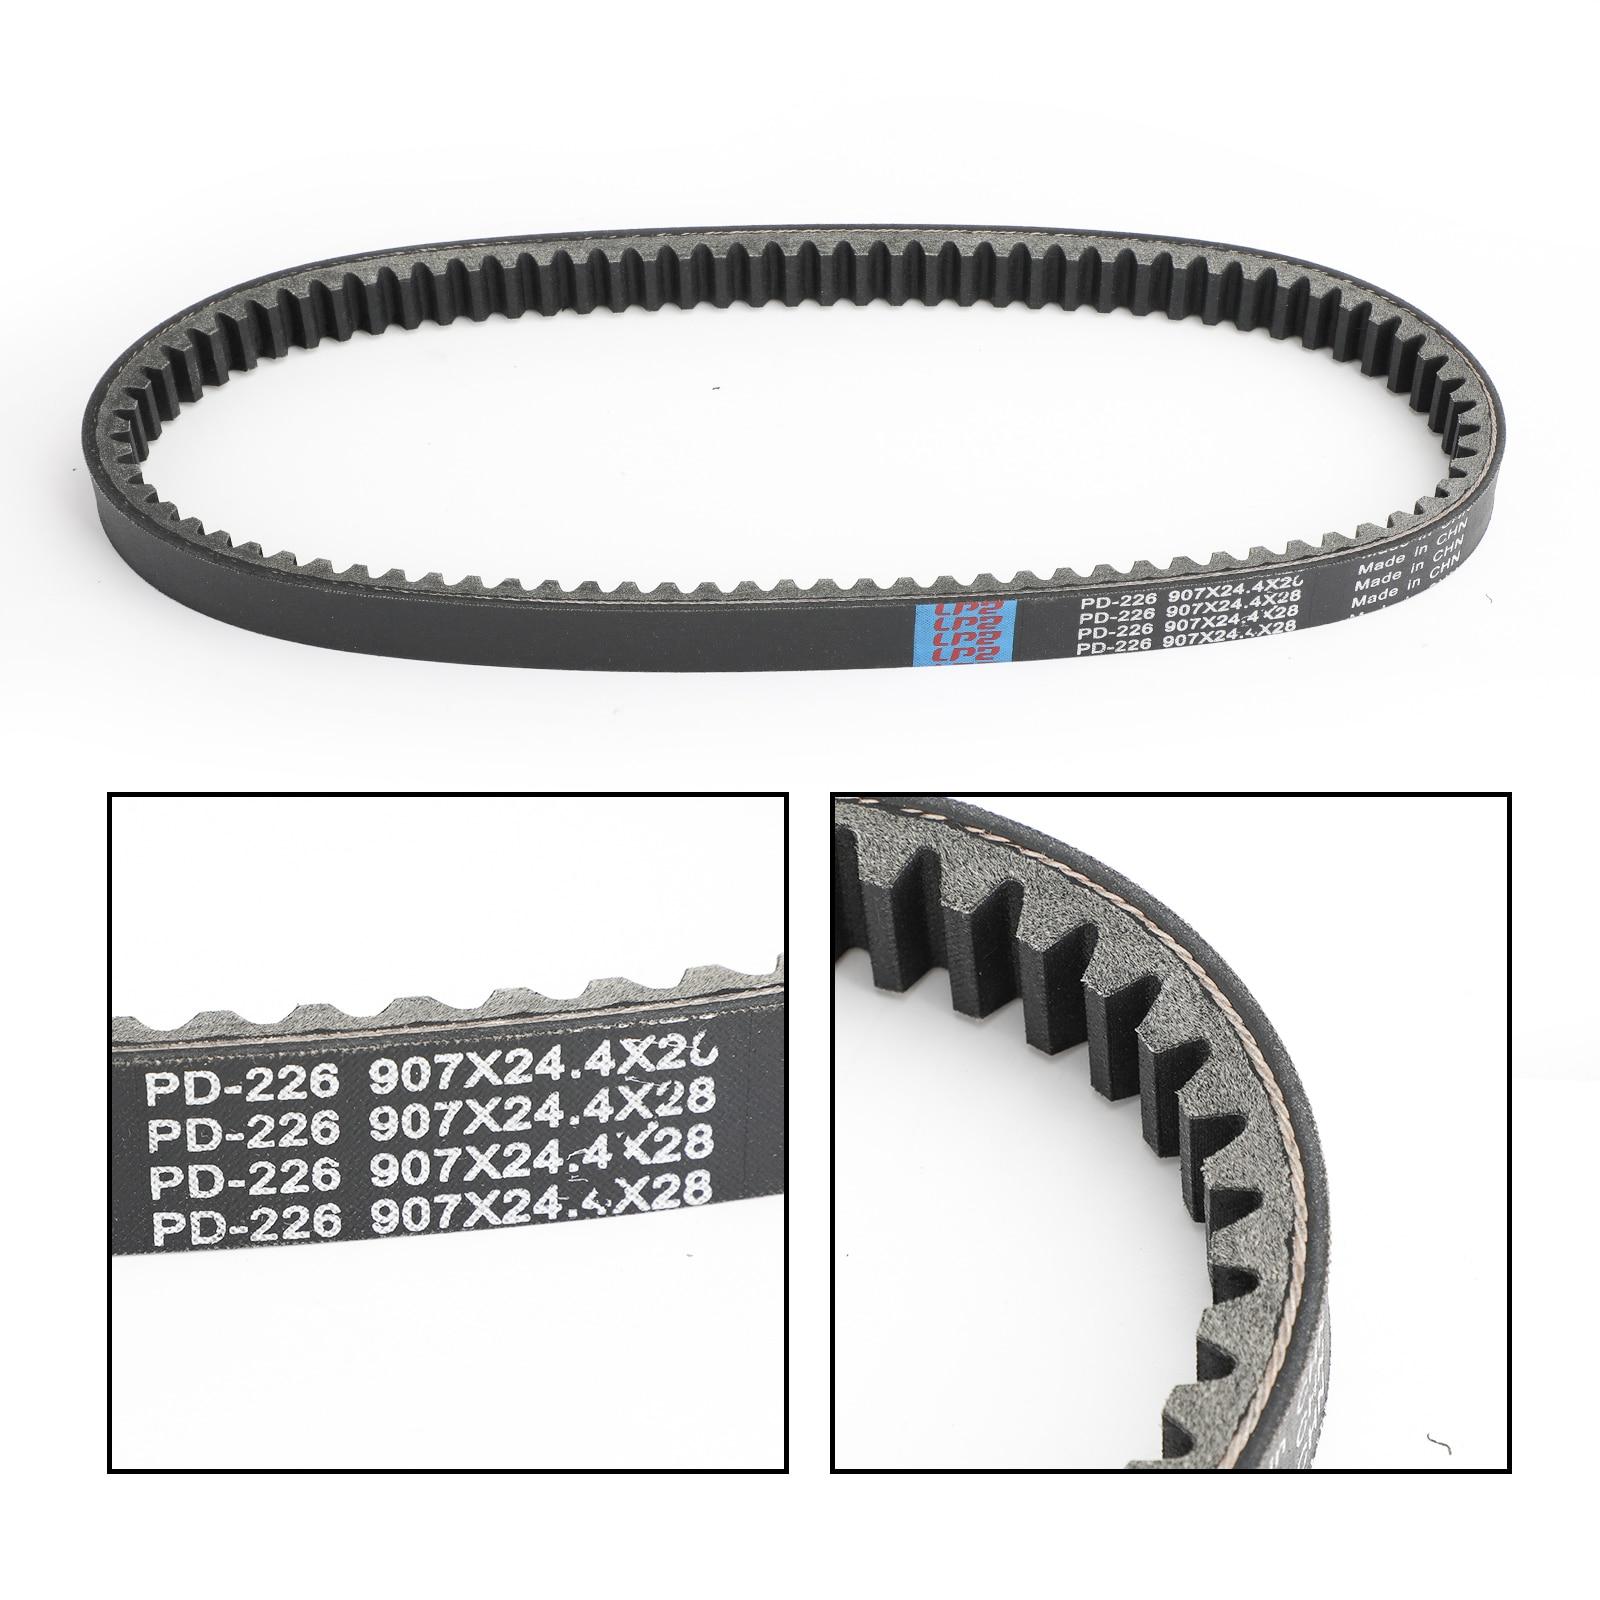 Artudatech Primary Drive Clutch Belt For SYM GTS JOYMAX 300 EFI EVO LM30W1-7 EFI EVO LN30A1-6